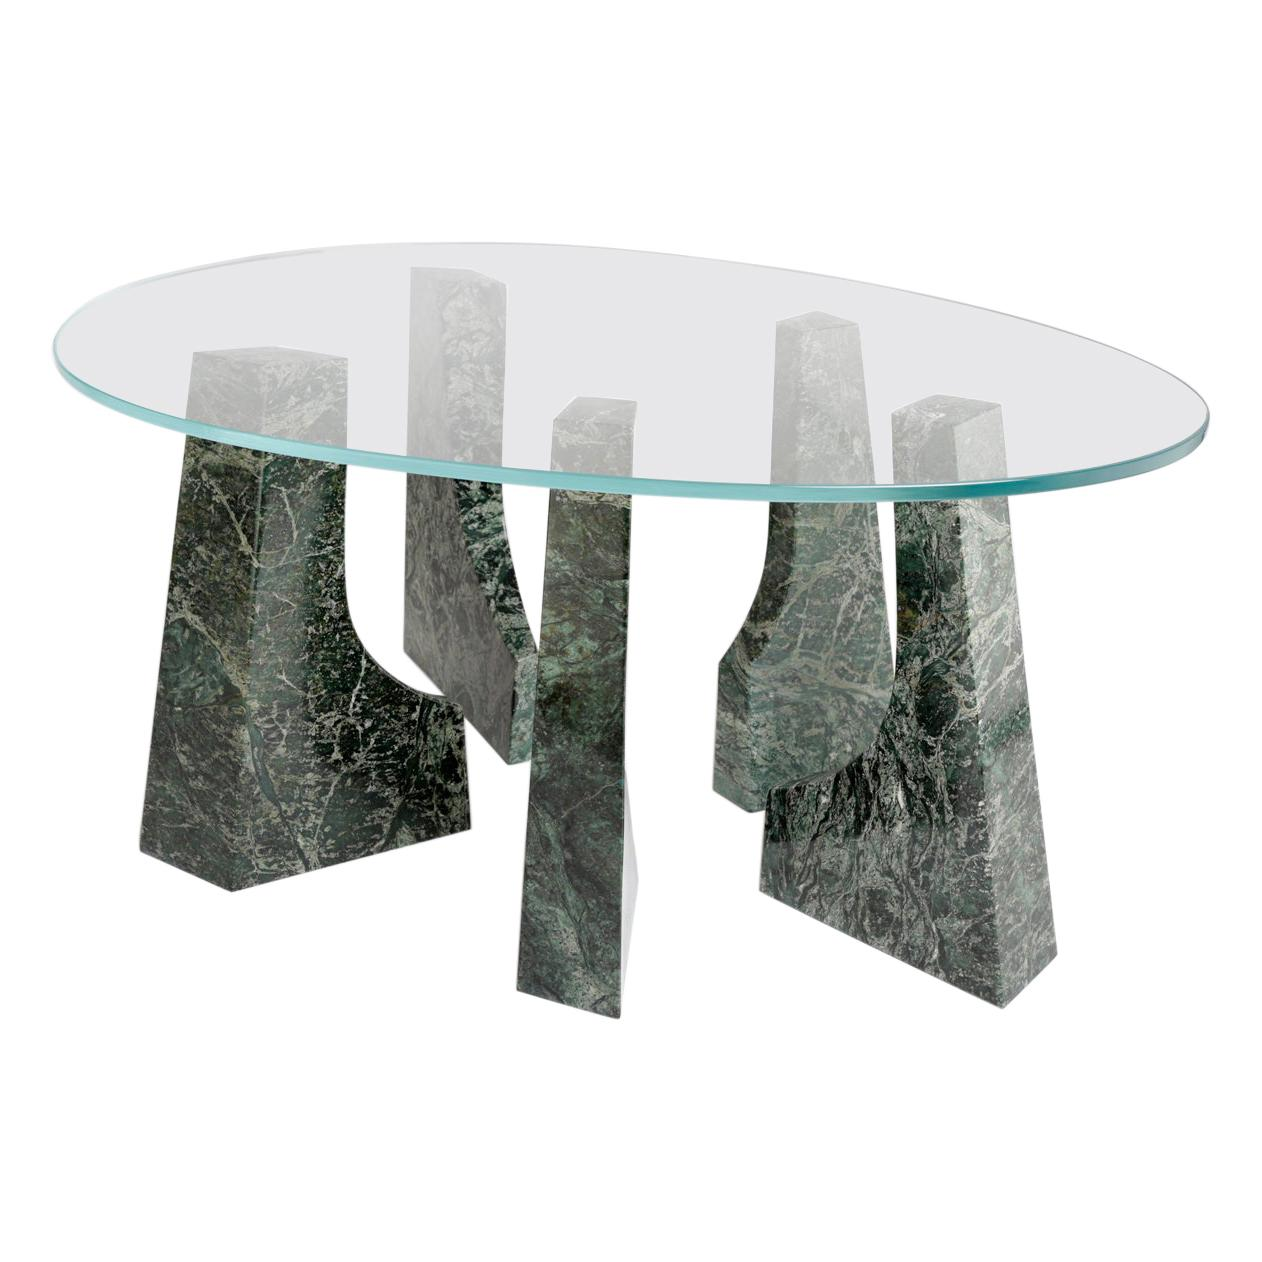 Trama Coffee Table by Comité de Proyectos